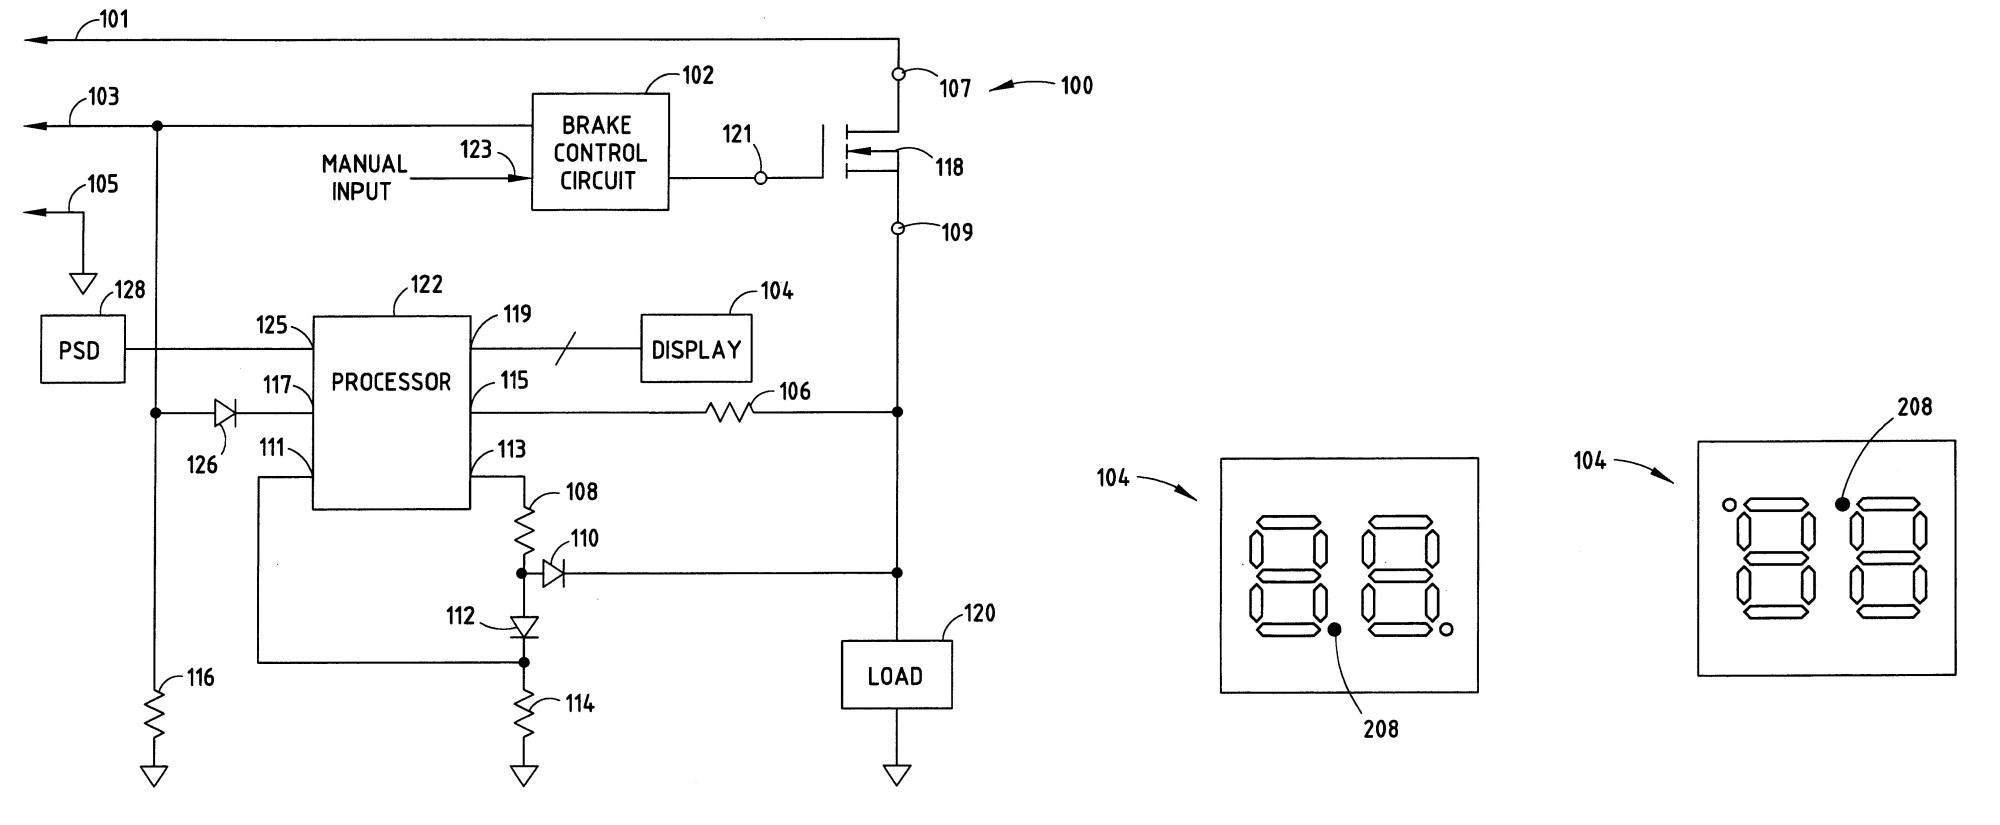 hight resolution of trailer breakaway wiring schematic wiring diagram for trailer breakaway switch save brake switch wiring diagram